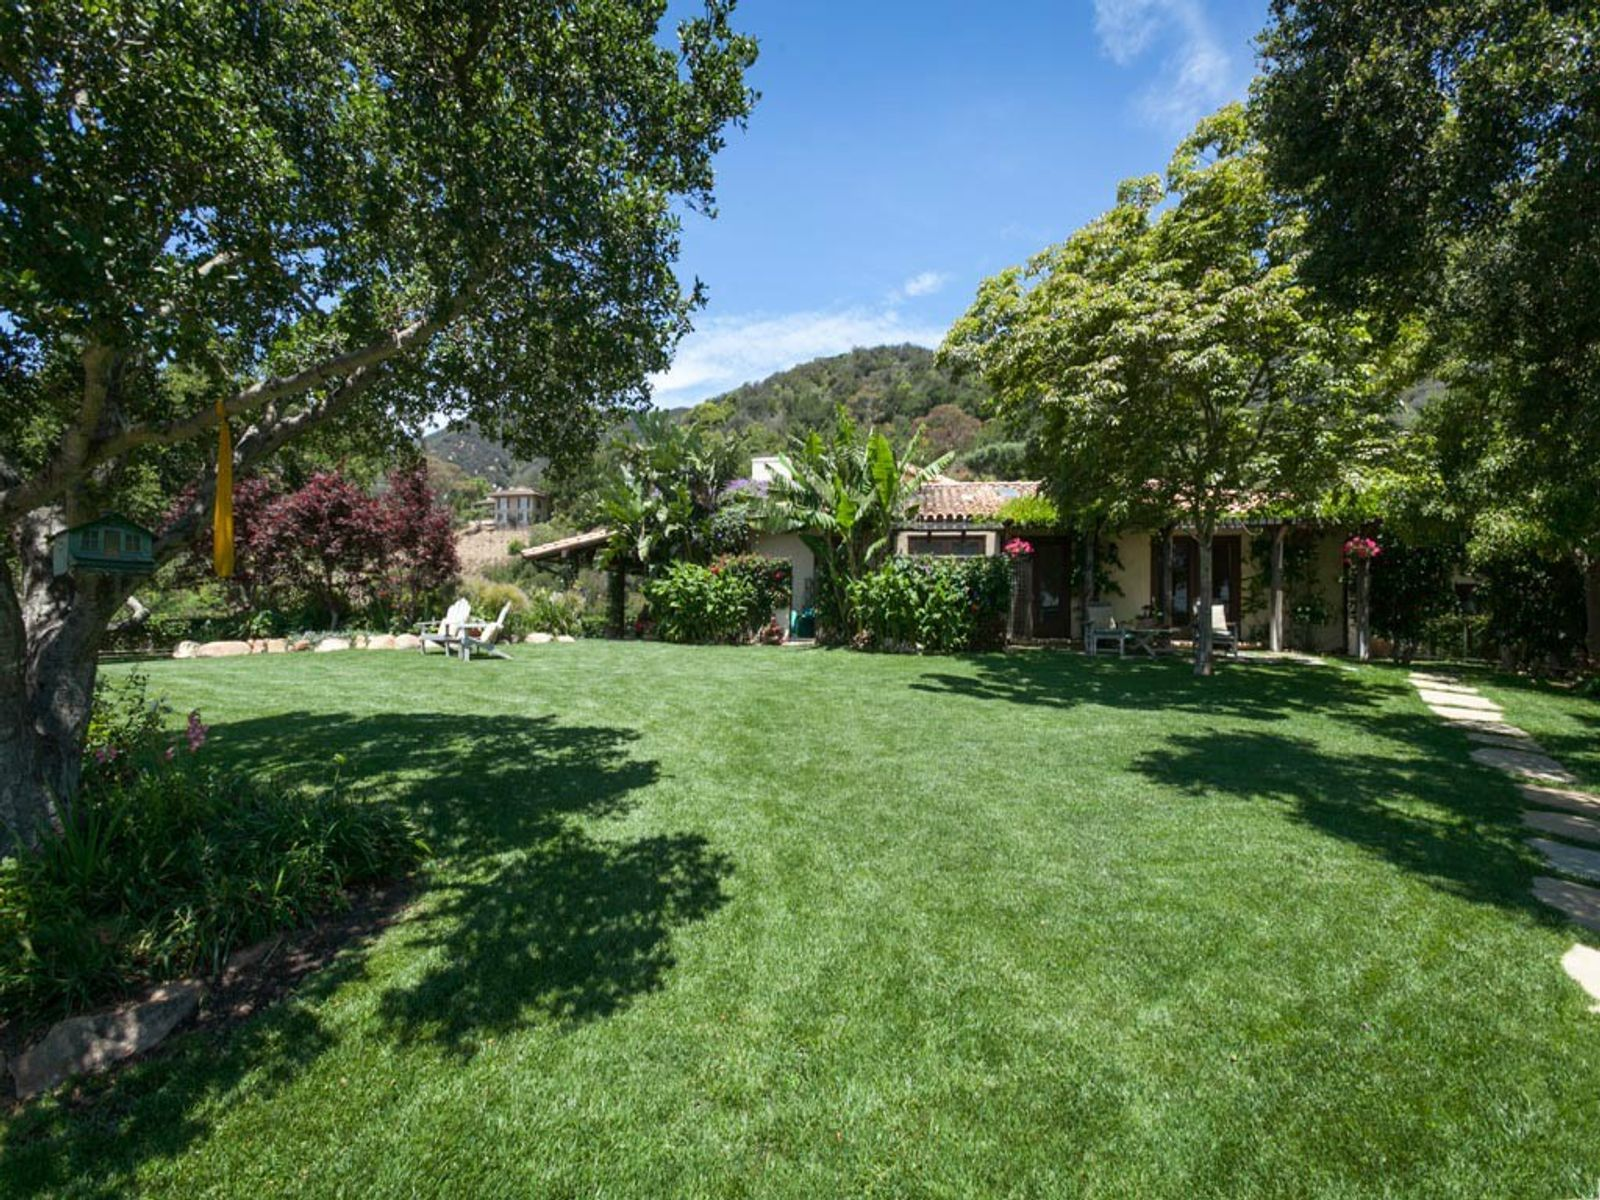 Backyard and Lawn